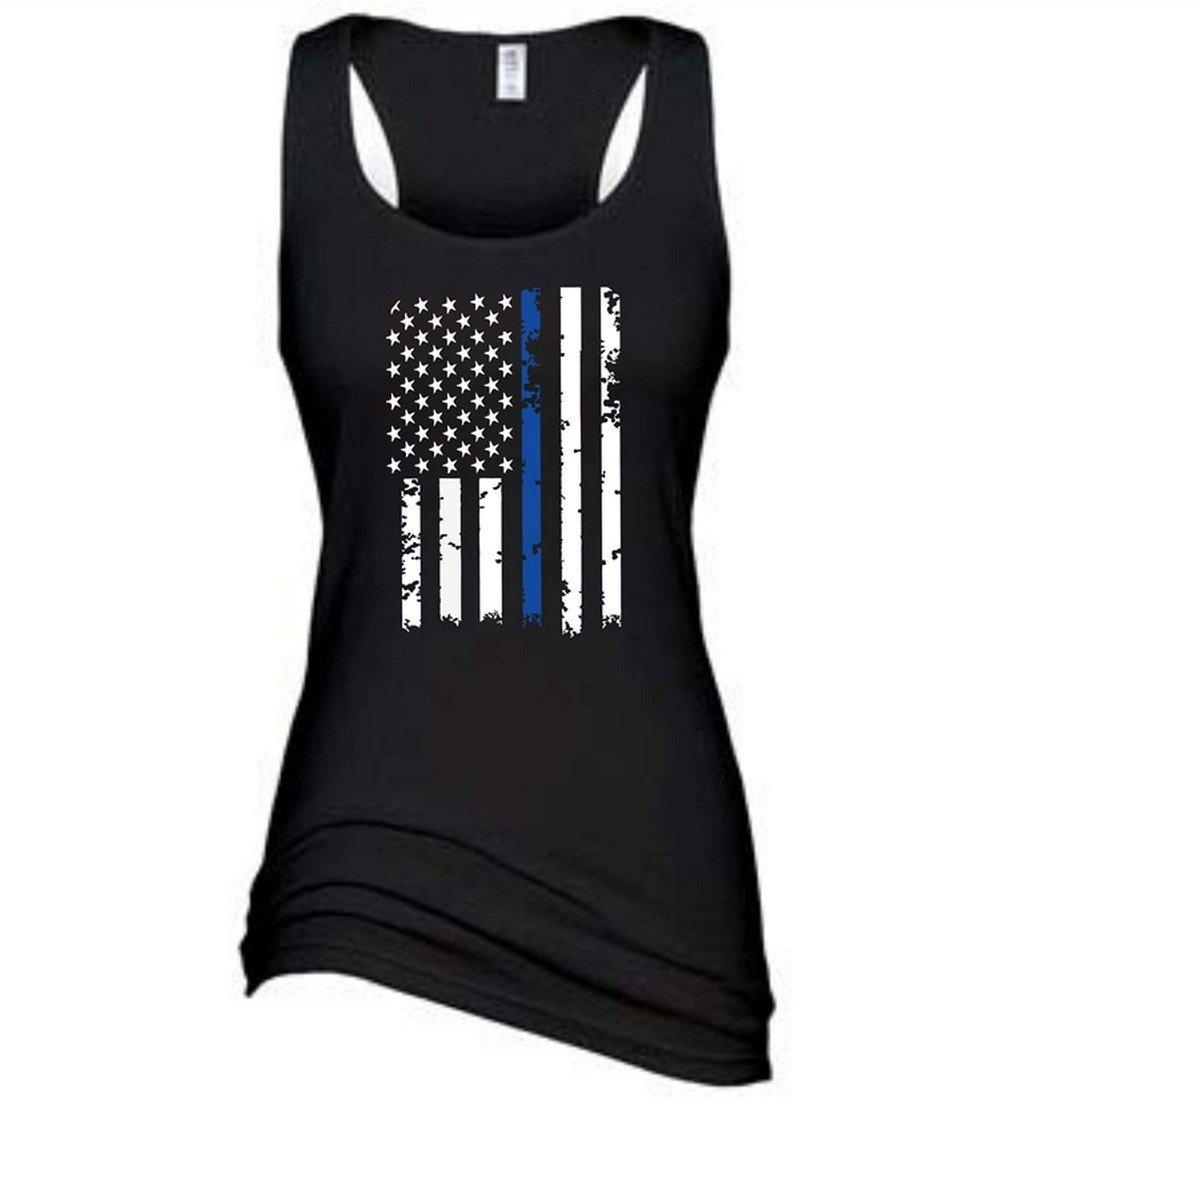 Women's Distressed Thin Blue Line Vertical U.S. Flag Racerback Tanktop